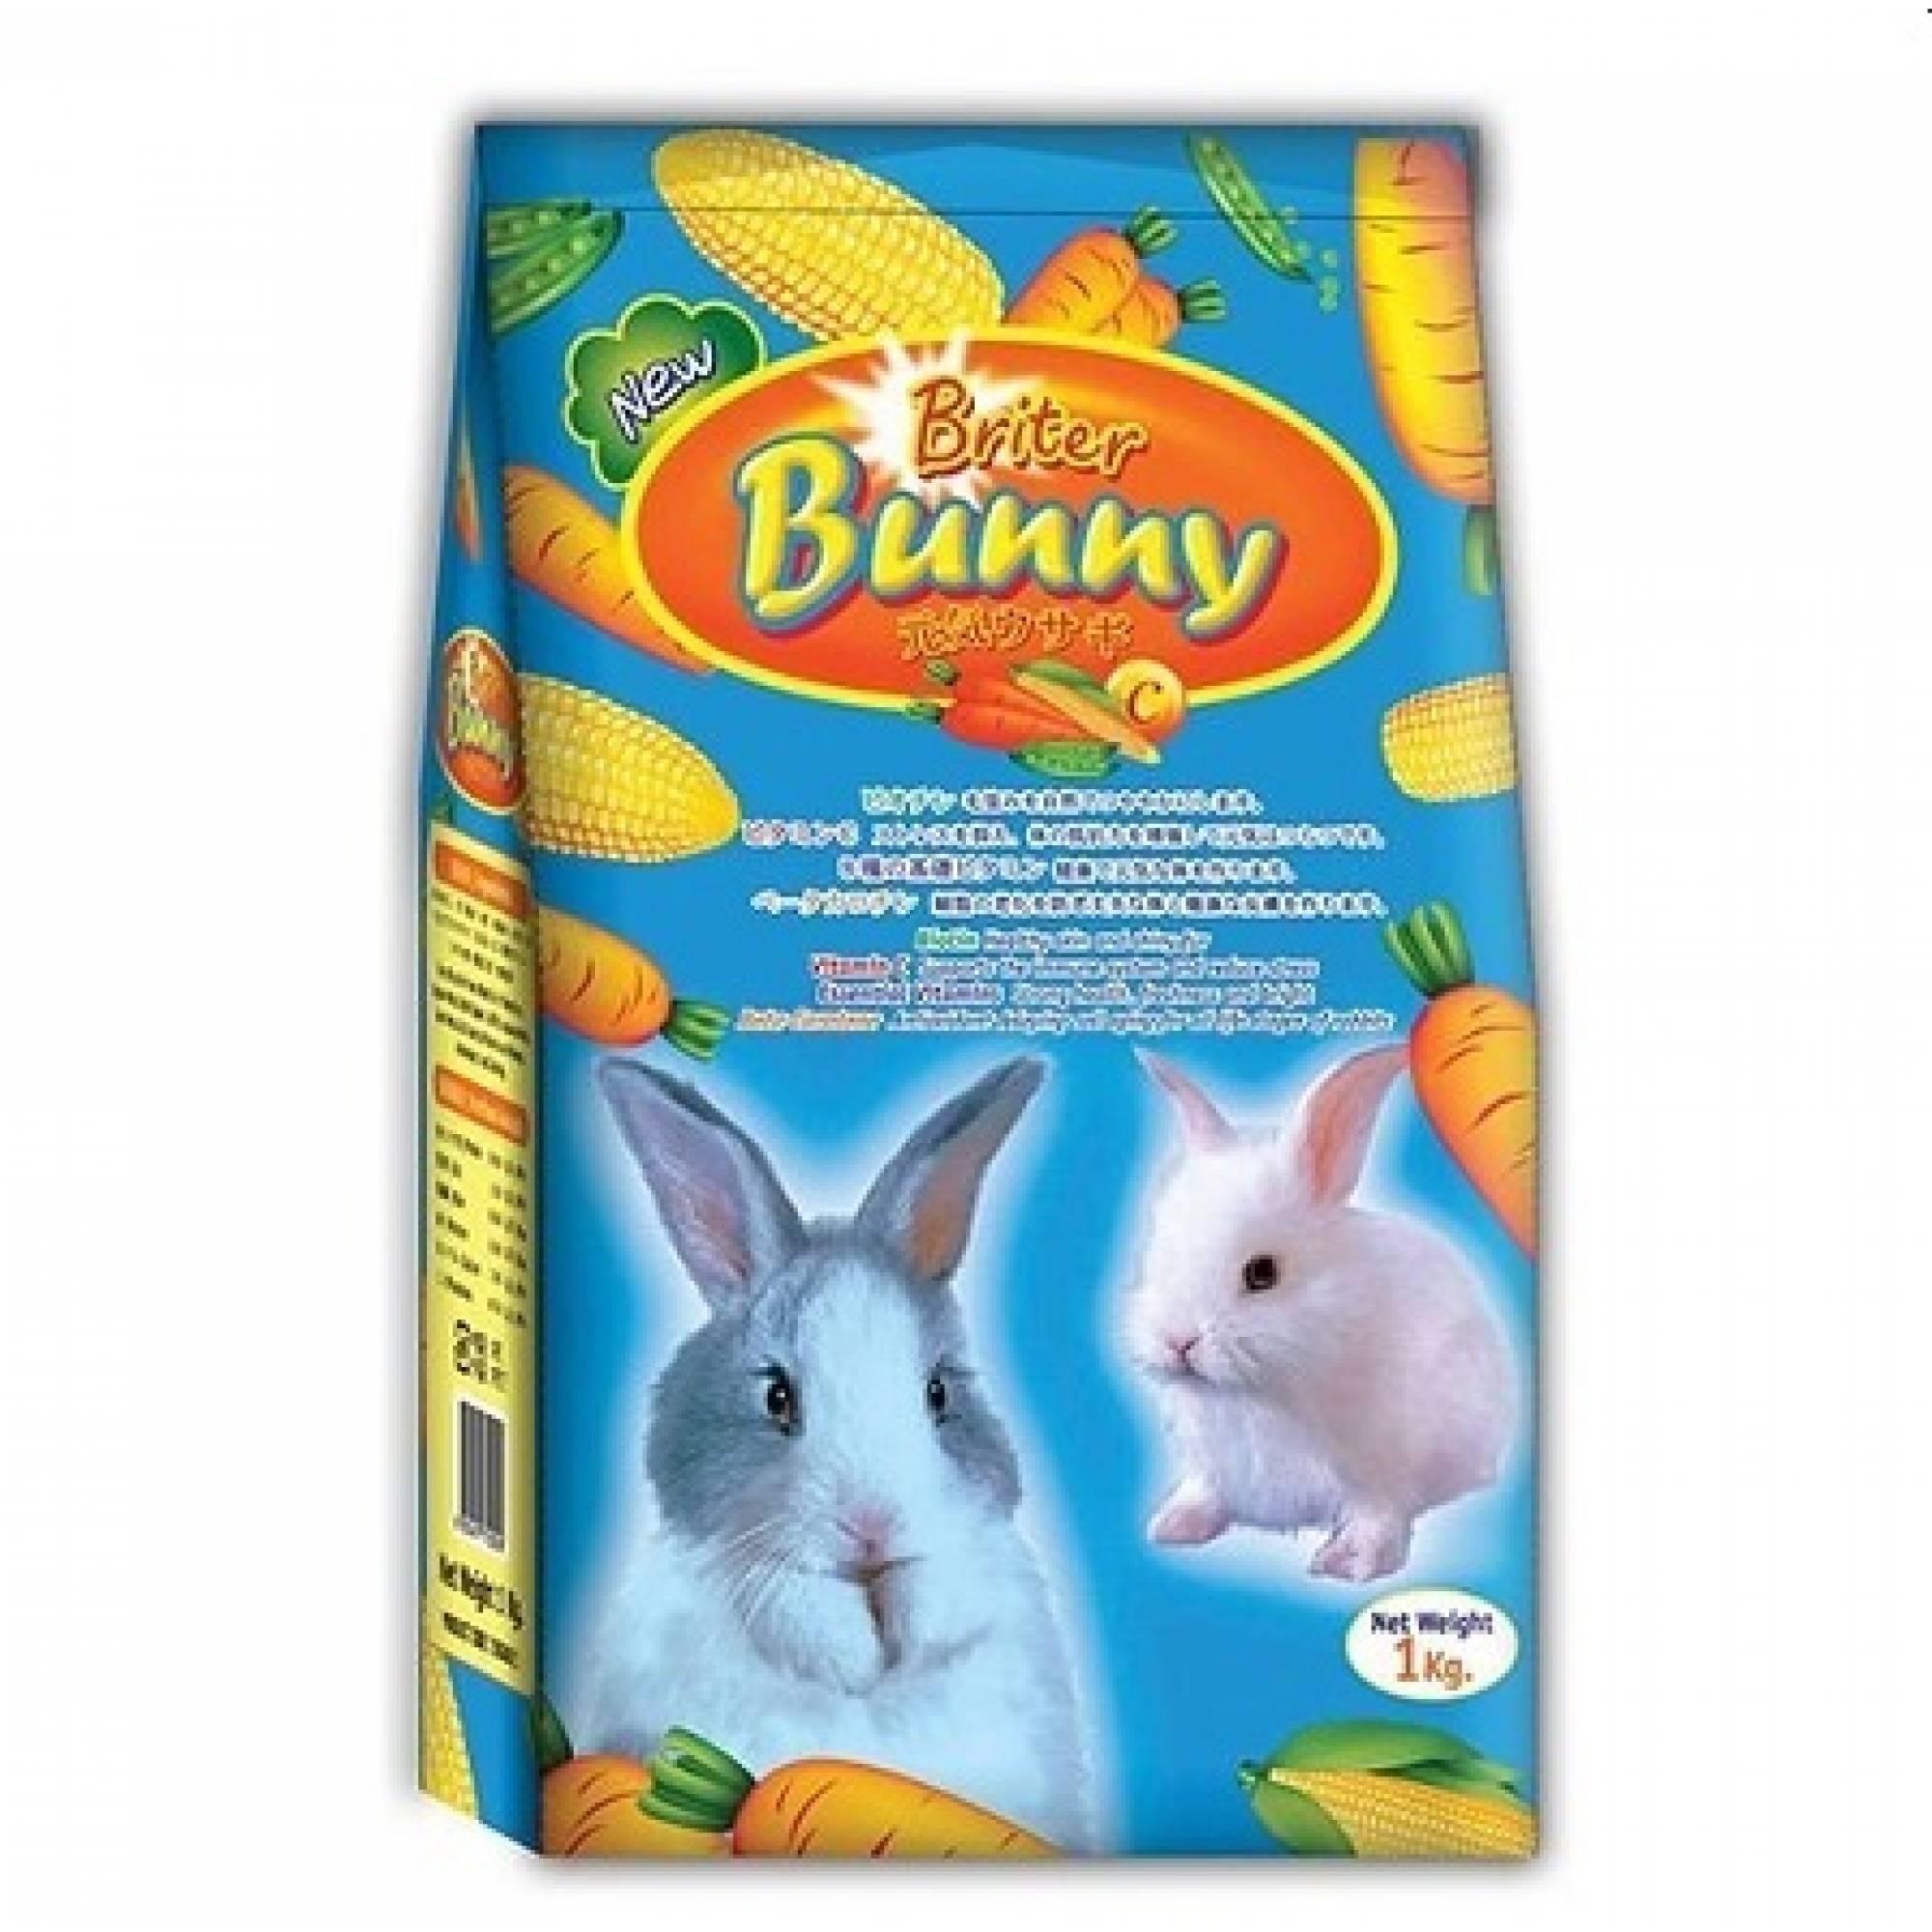 Briter Bunny Rabbit Food 1kg